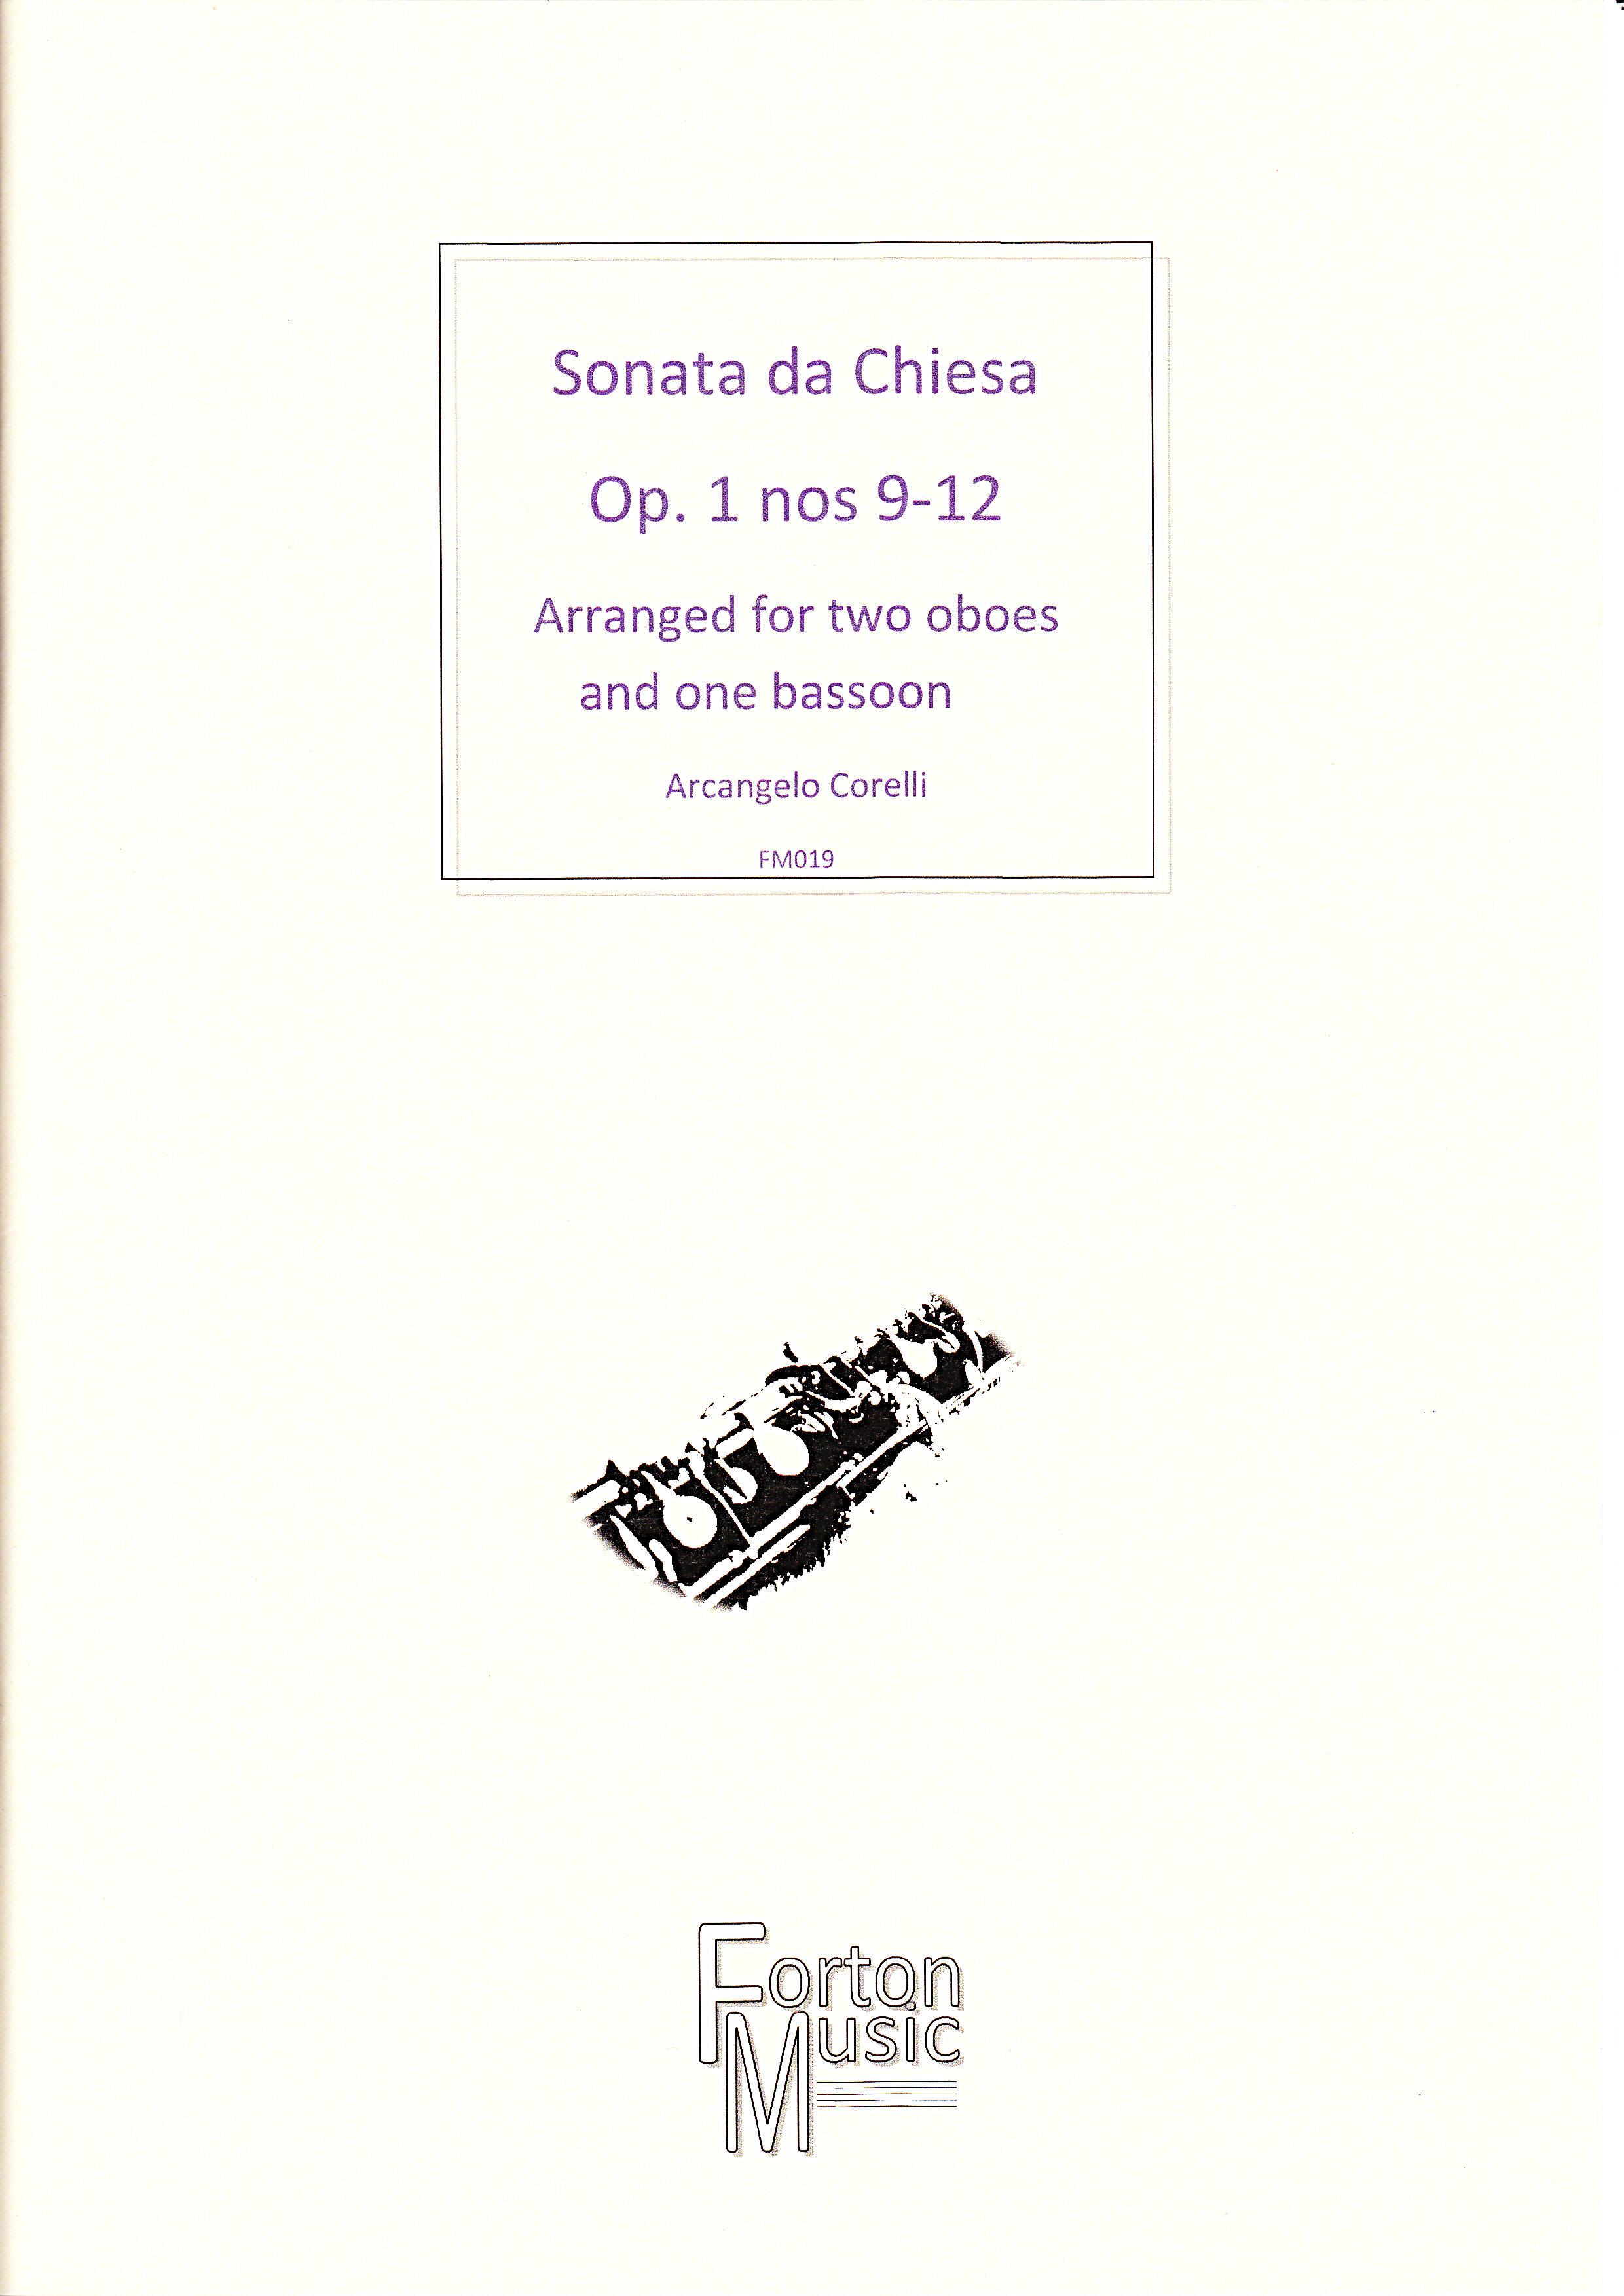 SONATA DA CHIESA Nos.9-12